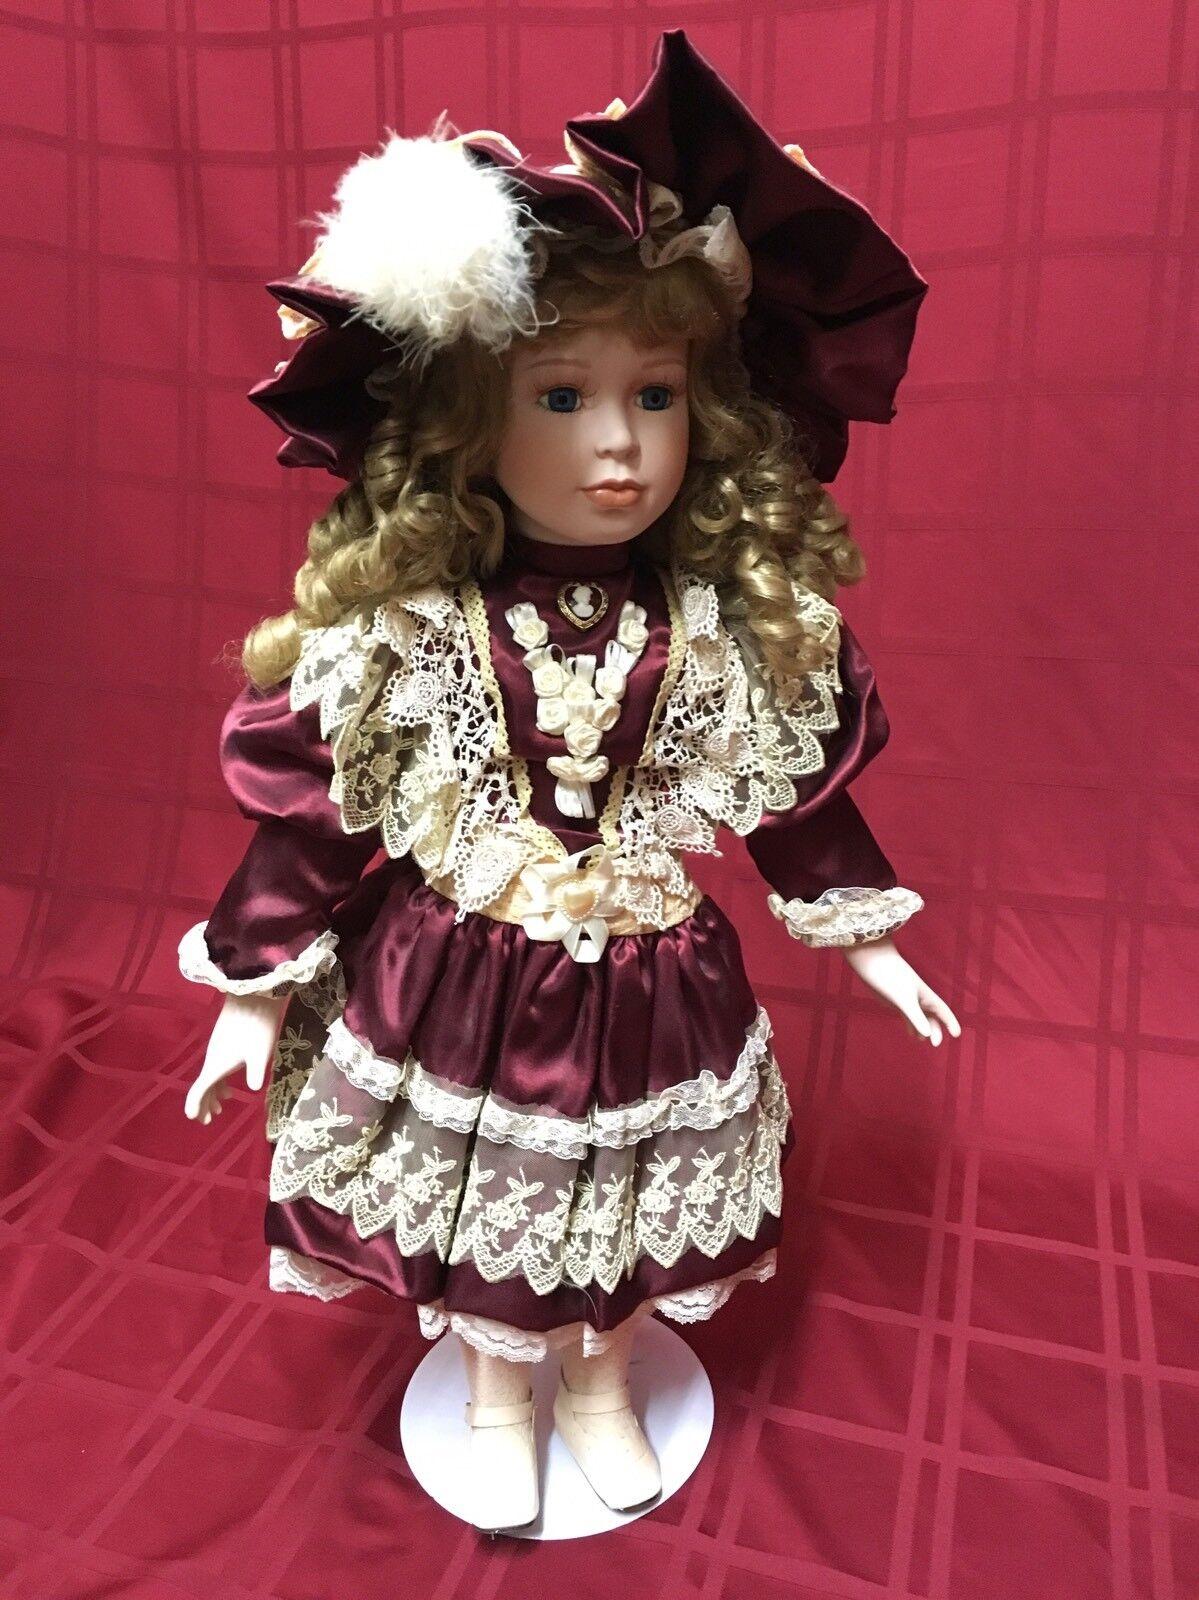 Tuss Collectible William Tung 24   Porcelain bambola Rich rosso Dress Lace Flowers Hat  il più economico